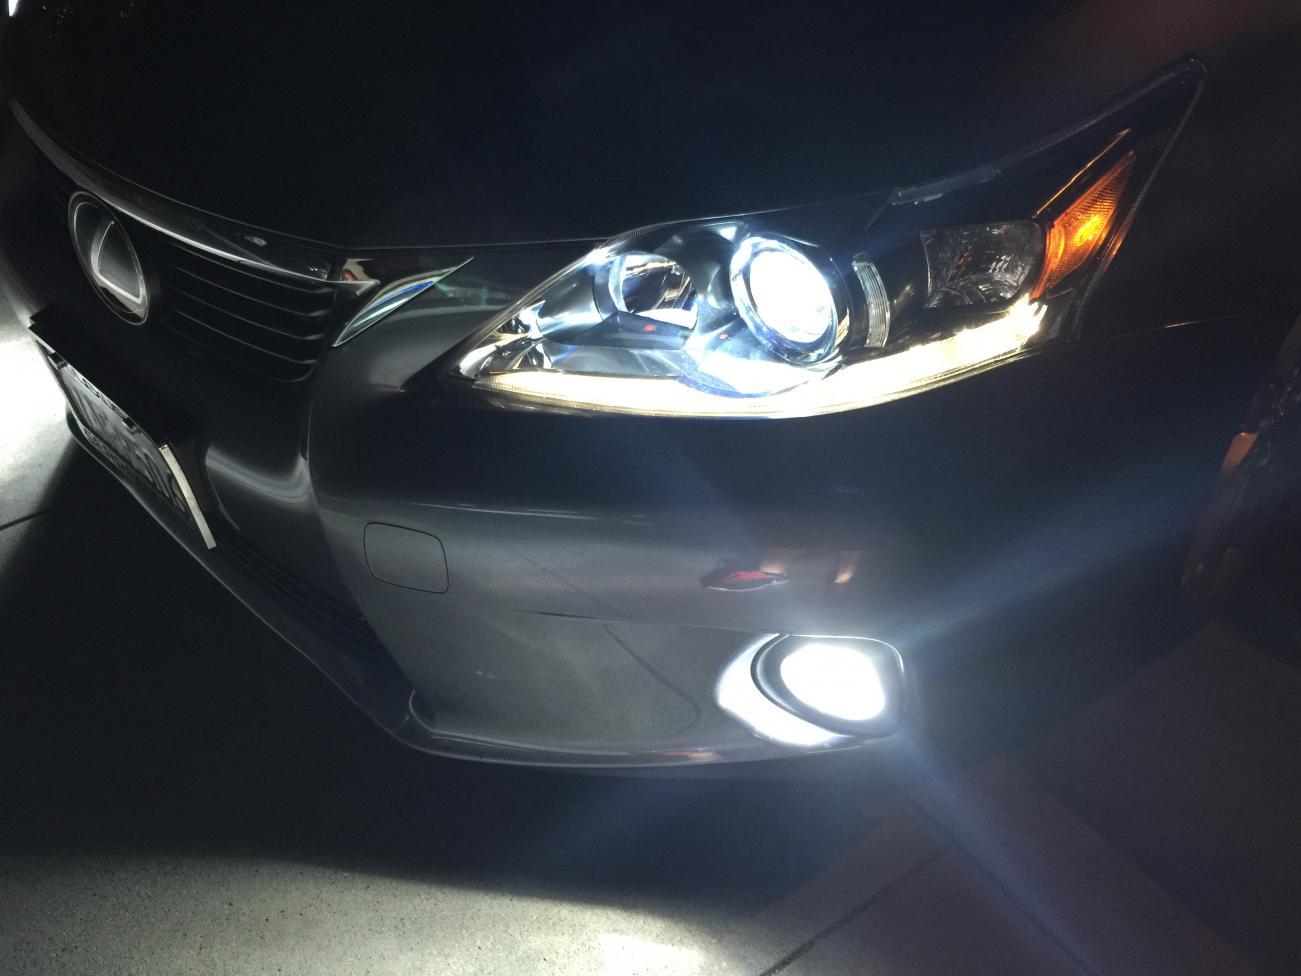 Lexus Is350 Headlight Wiring Diagram Lfa Headlights Led Diagrams Schematics On Gx470